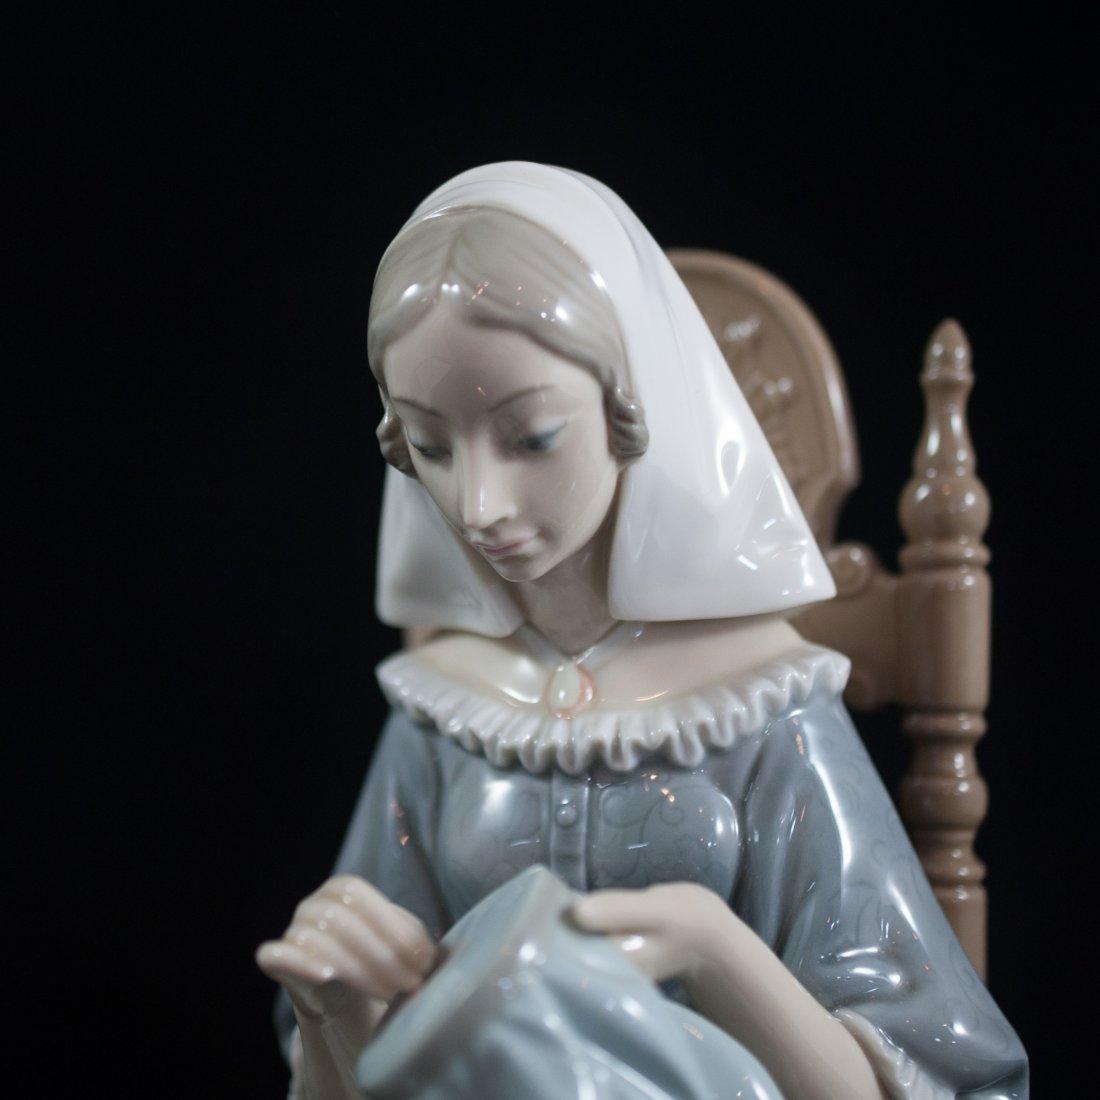 Lladro Porcelain Figurine of Woman Knitting - 5